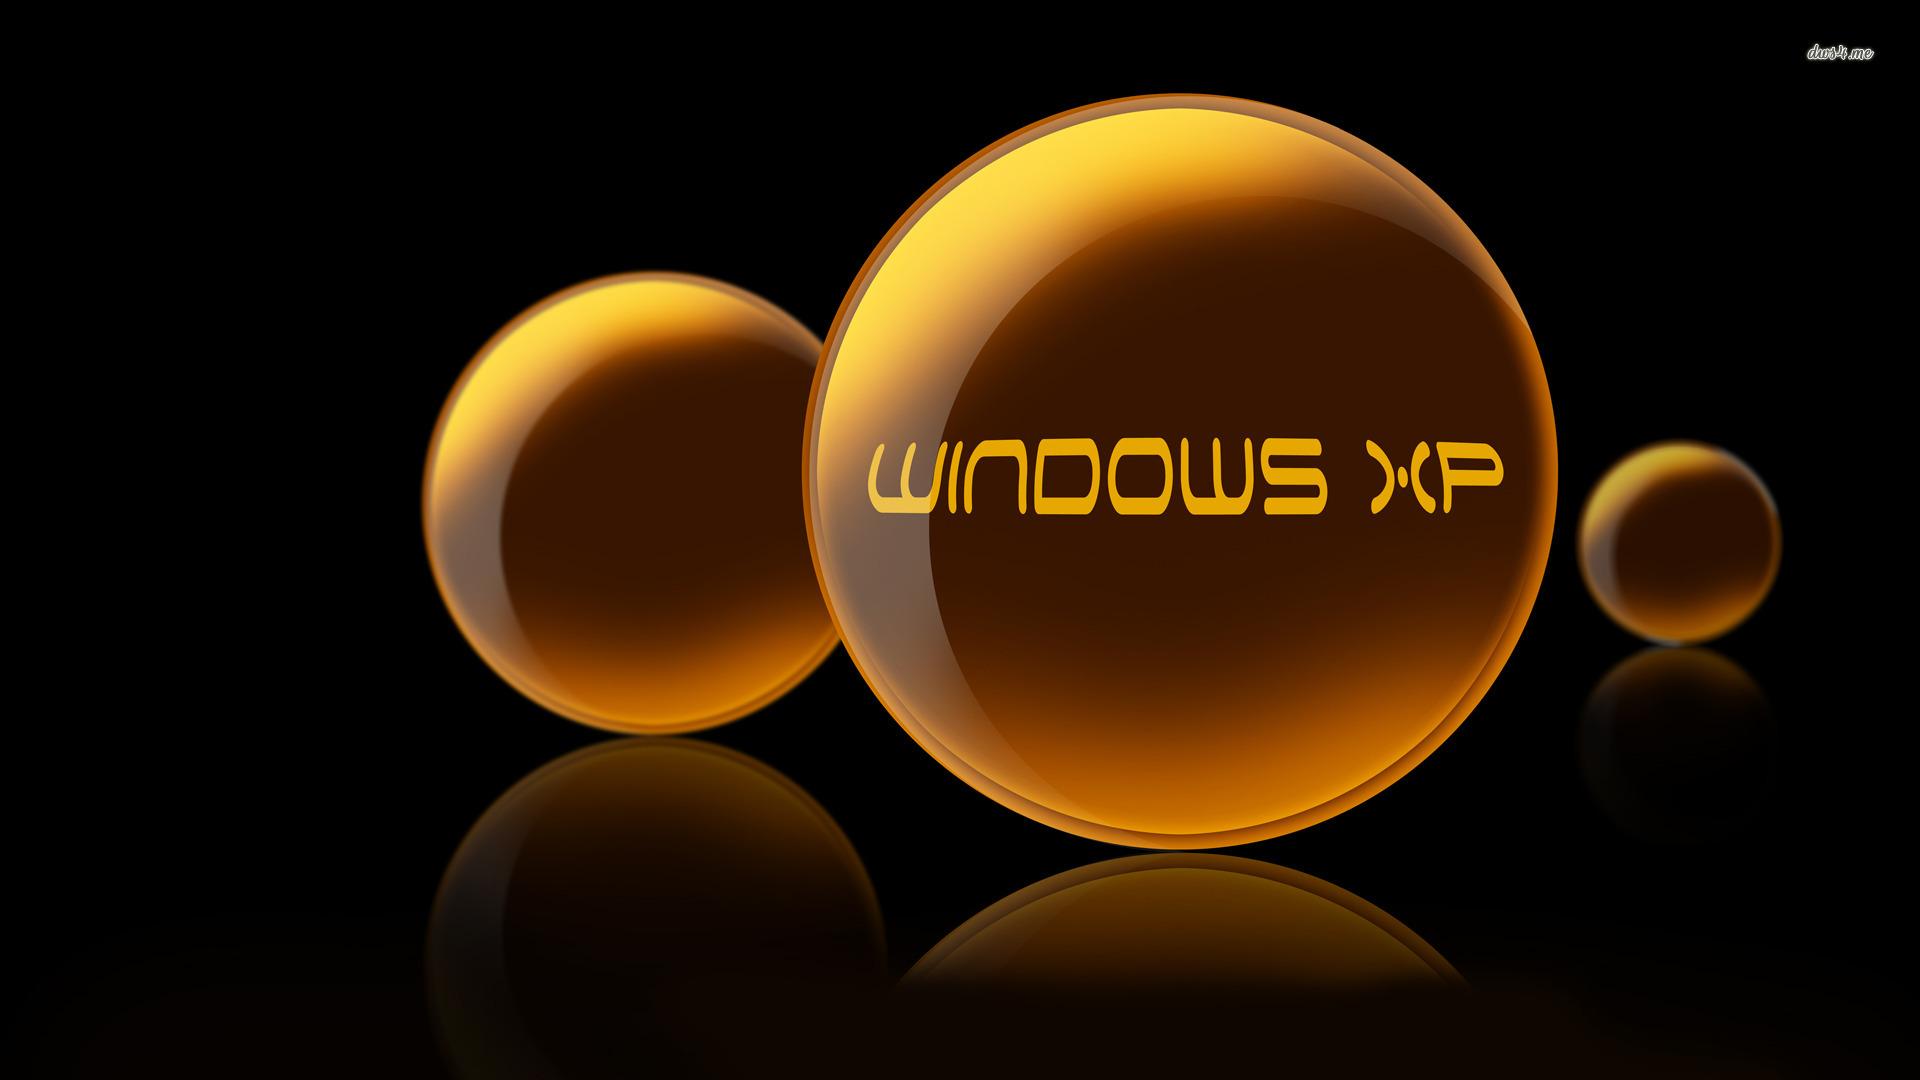 Fondo De Pantalla De Xp En Hd: 50 Cool Windows XP Wallpapers In HD For Free Download